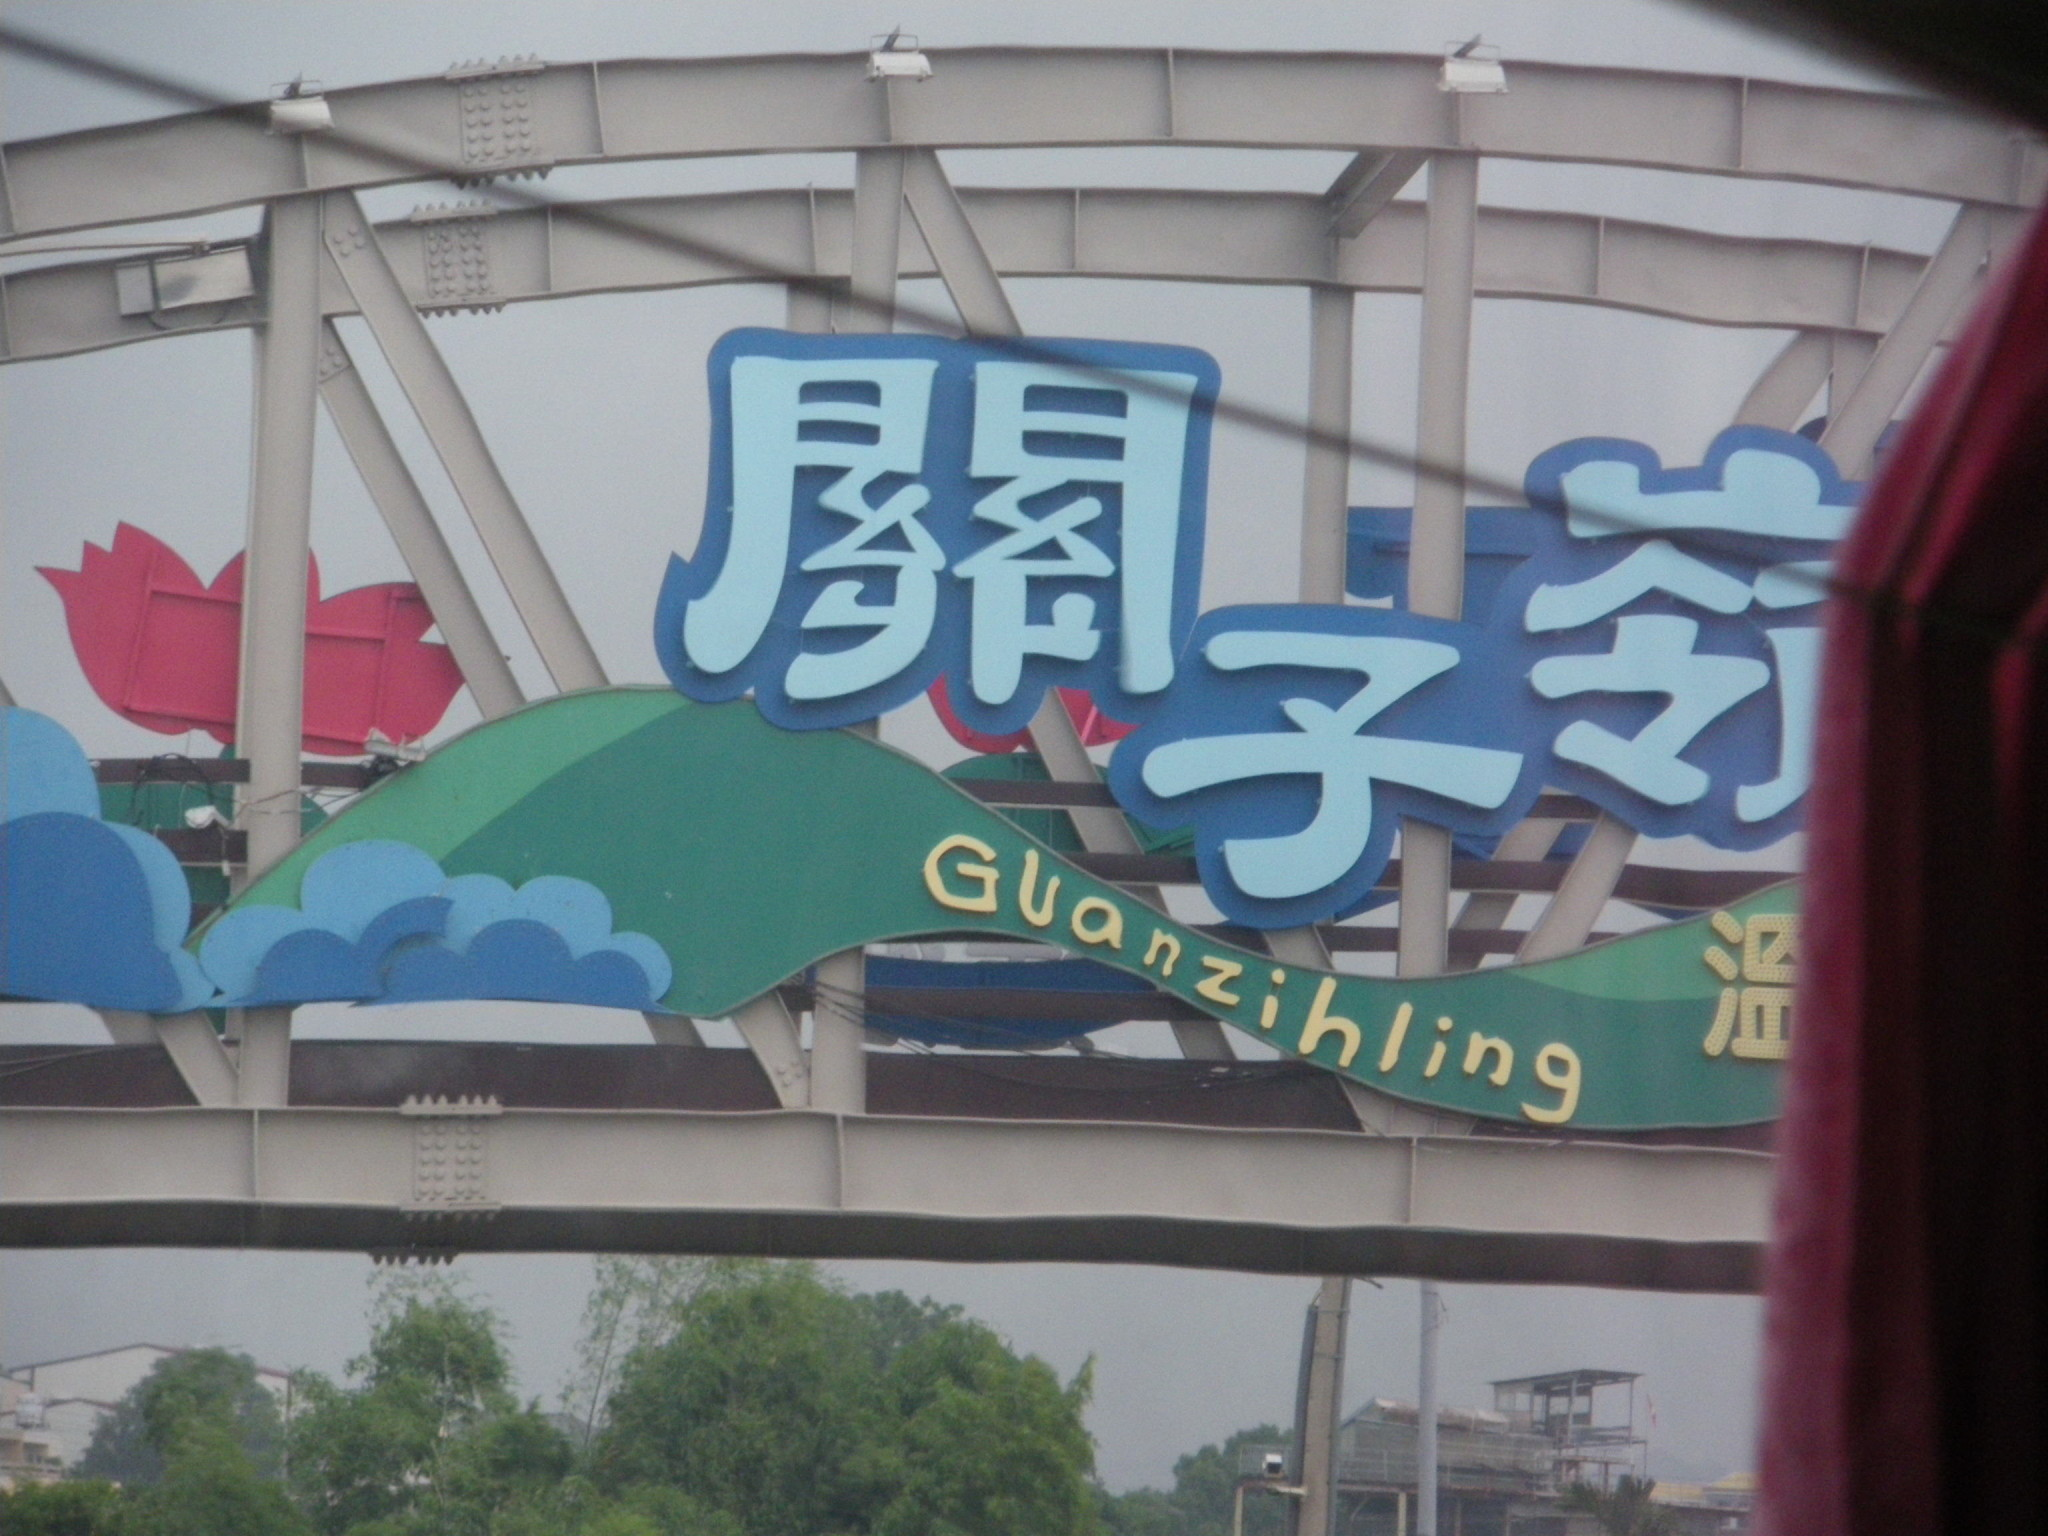 Jonny Blair in Kwan Tzu Ling Taiwan a lifestyle of travel